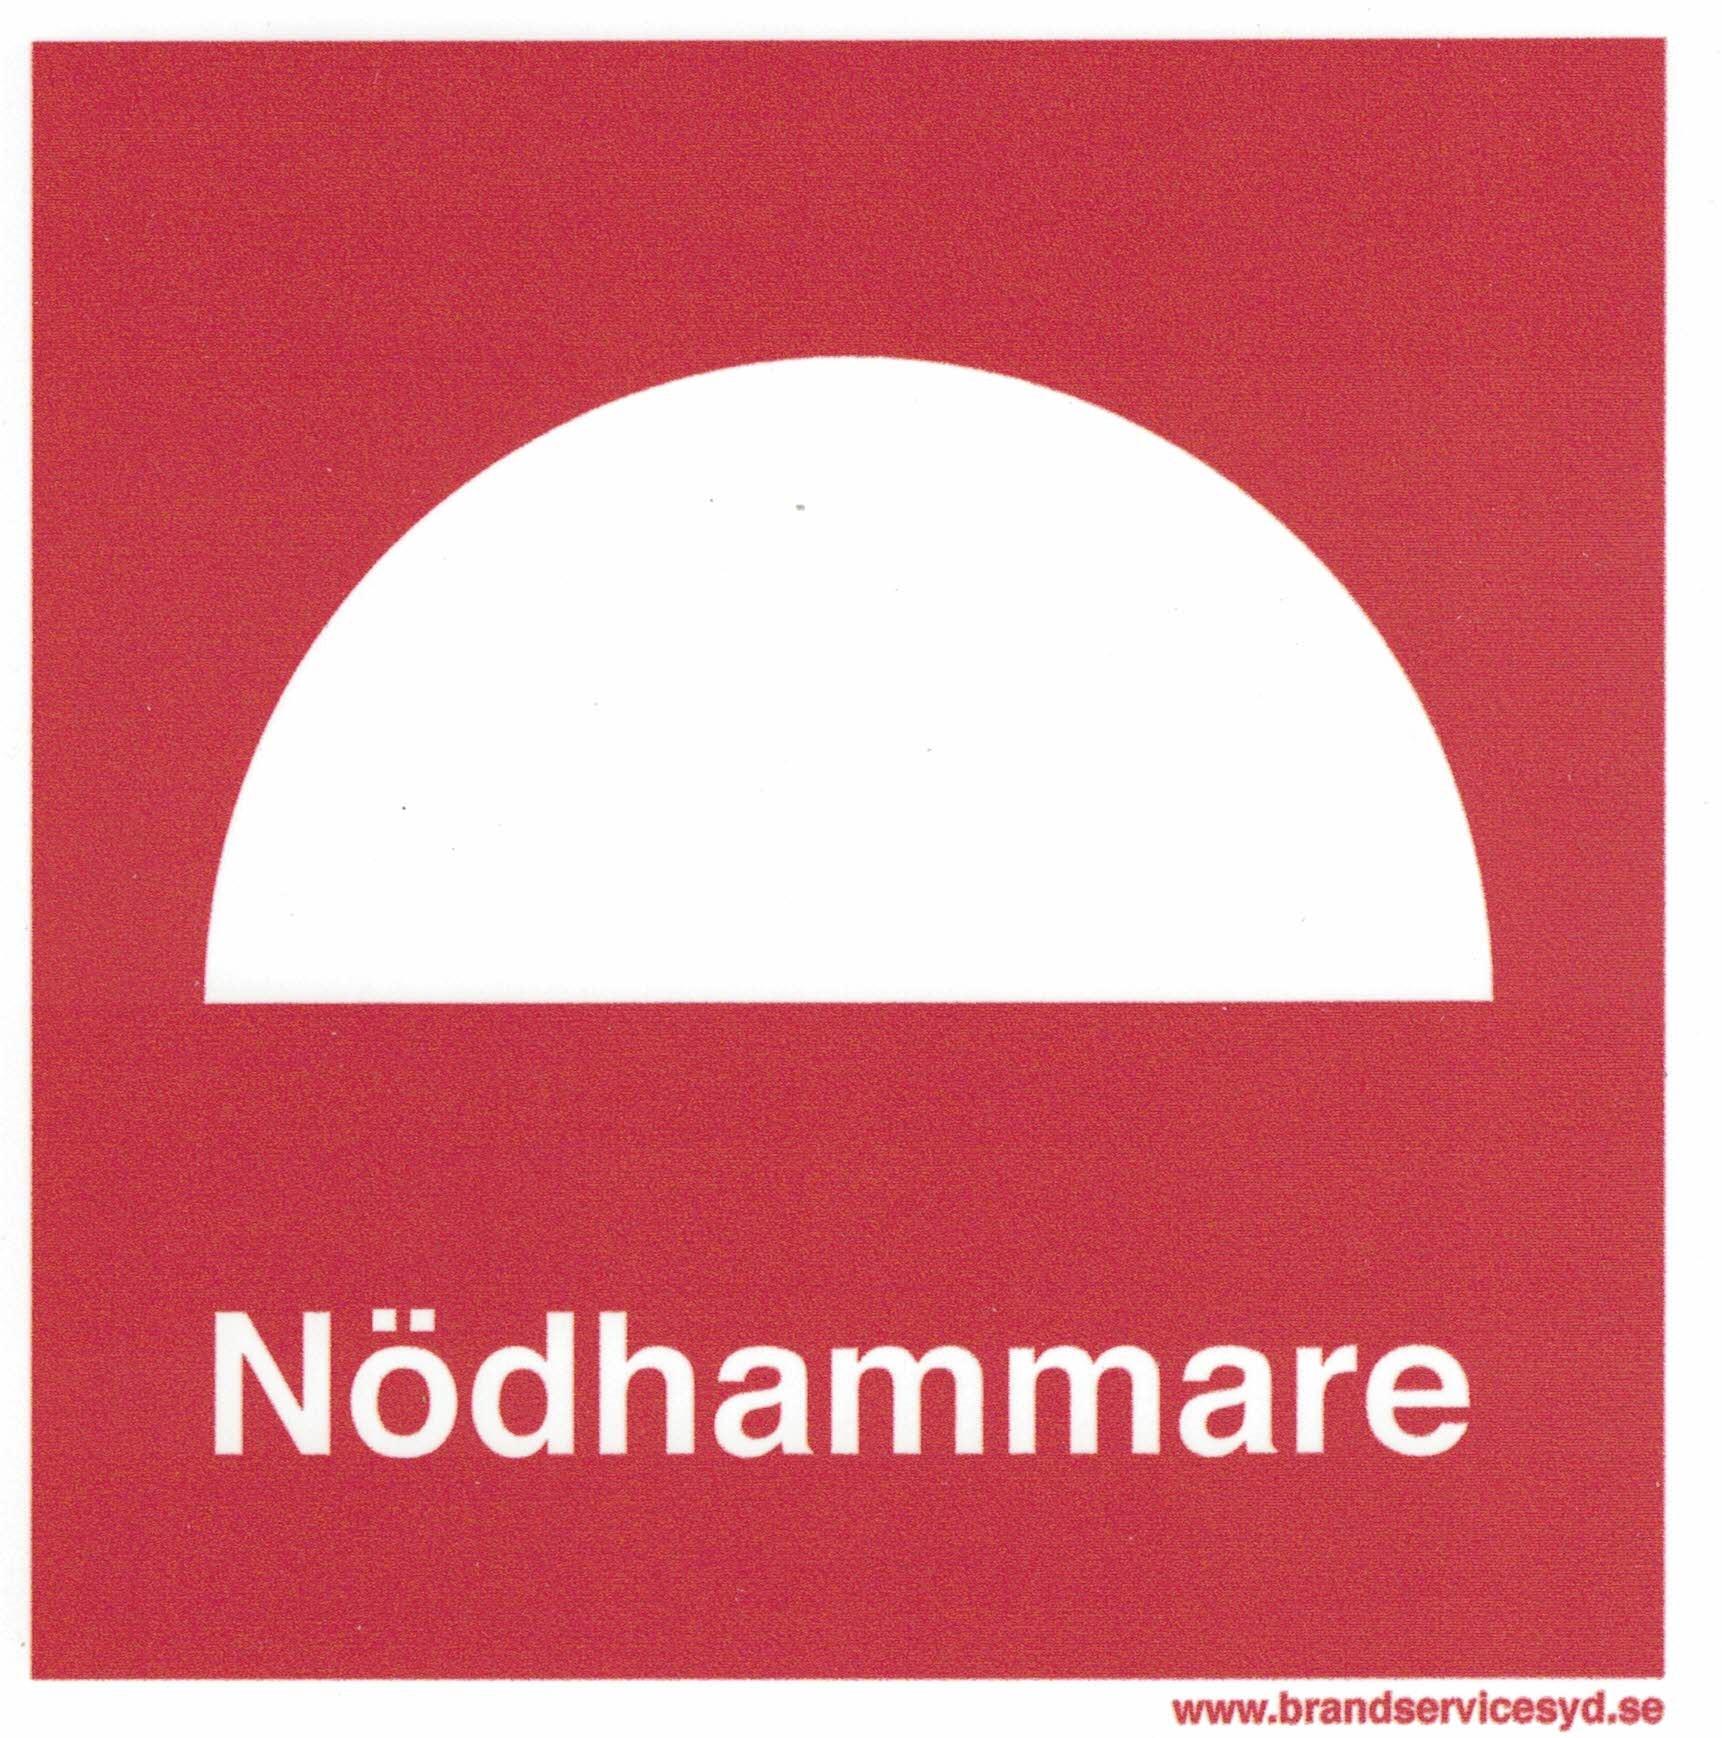 Nödhammare 20180819